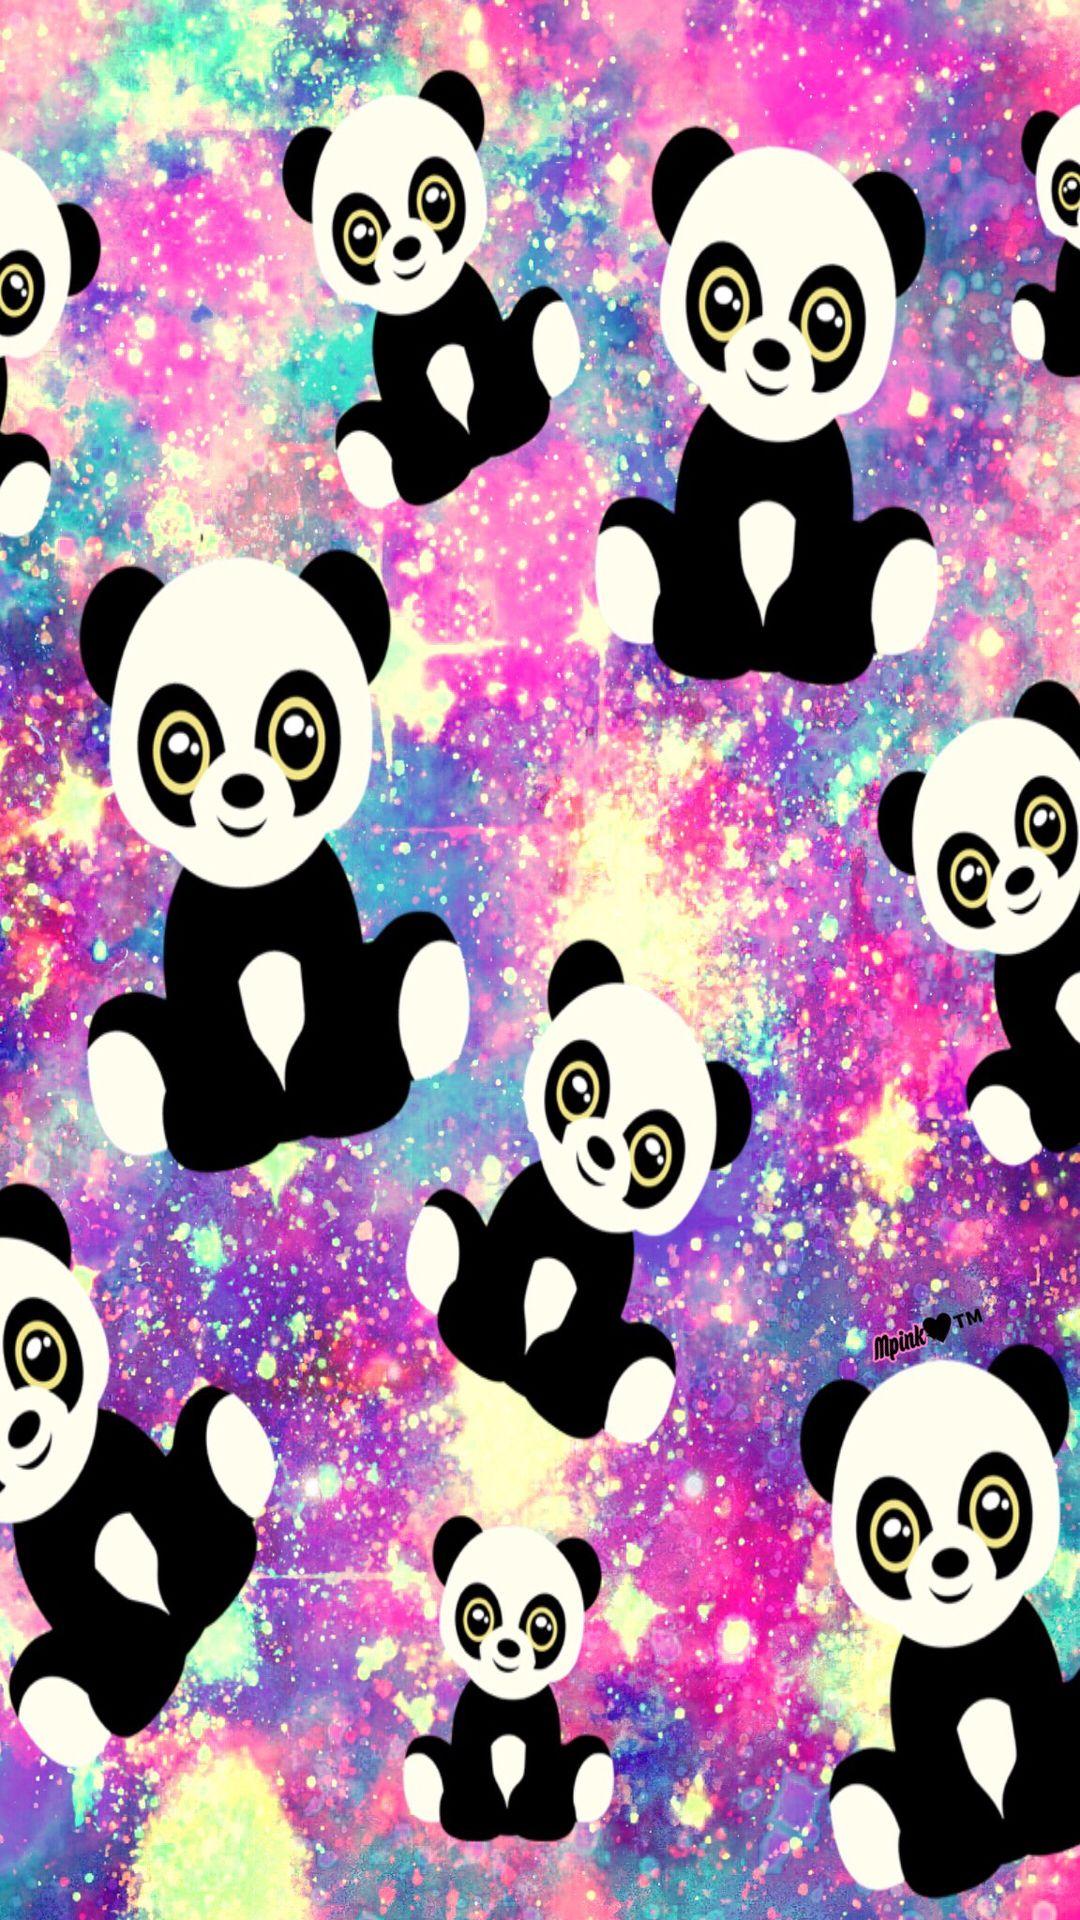 Cute Panda Galaxy Wallpaper Androidwallpaper Iphonewallpaper Wallpaper Galaxy Sparkle Glitter Lockscreen Pr Cute Wallpapers Galaxy Wallpaper Panda Love